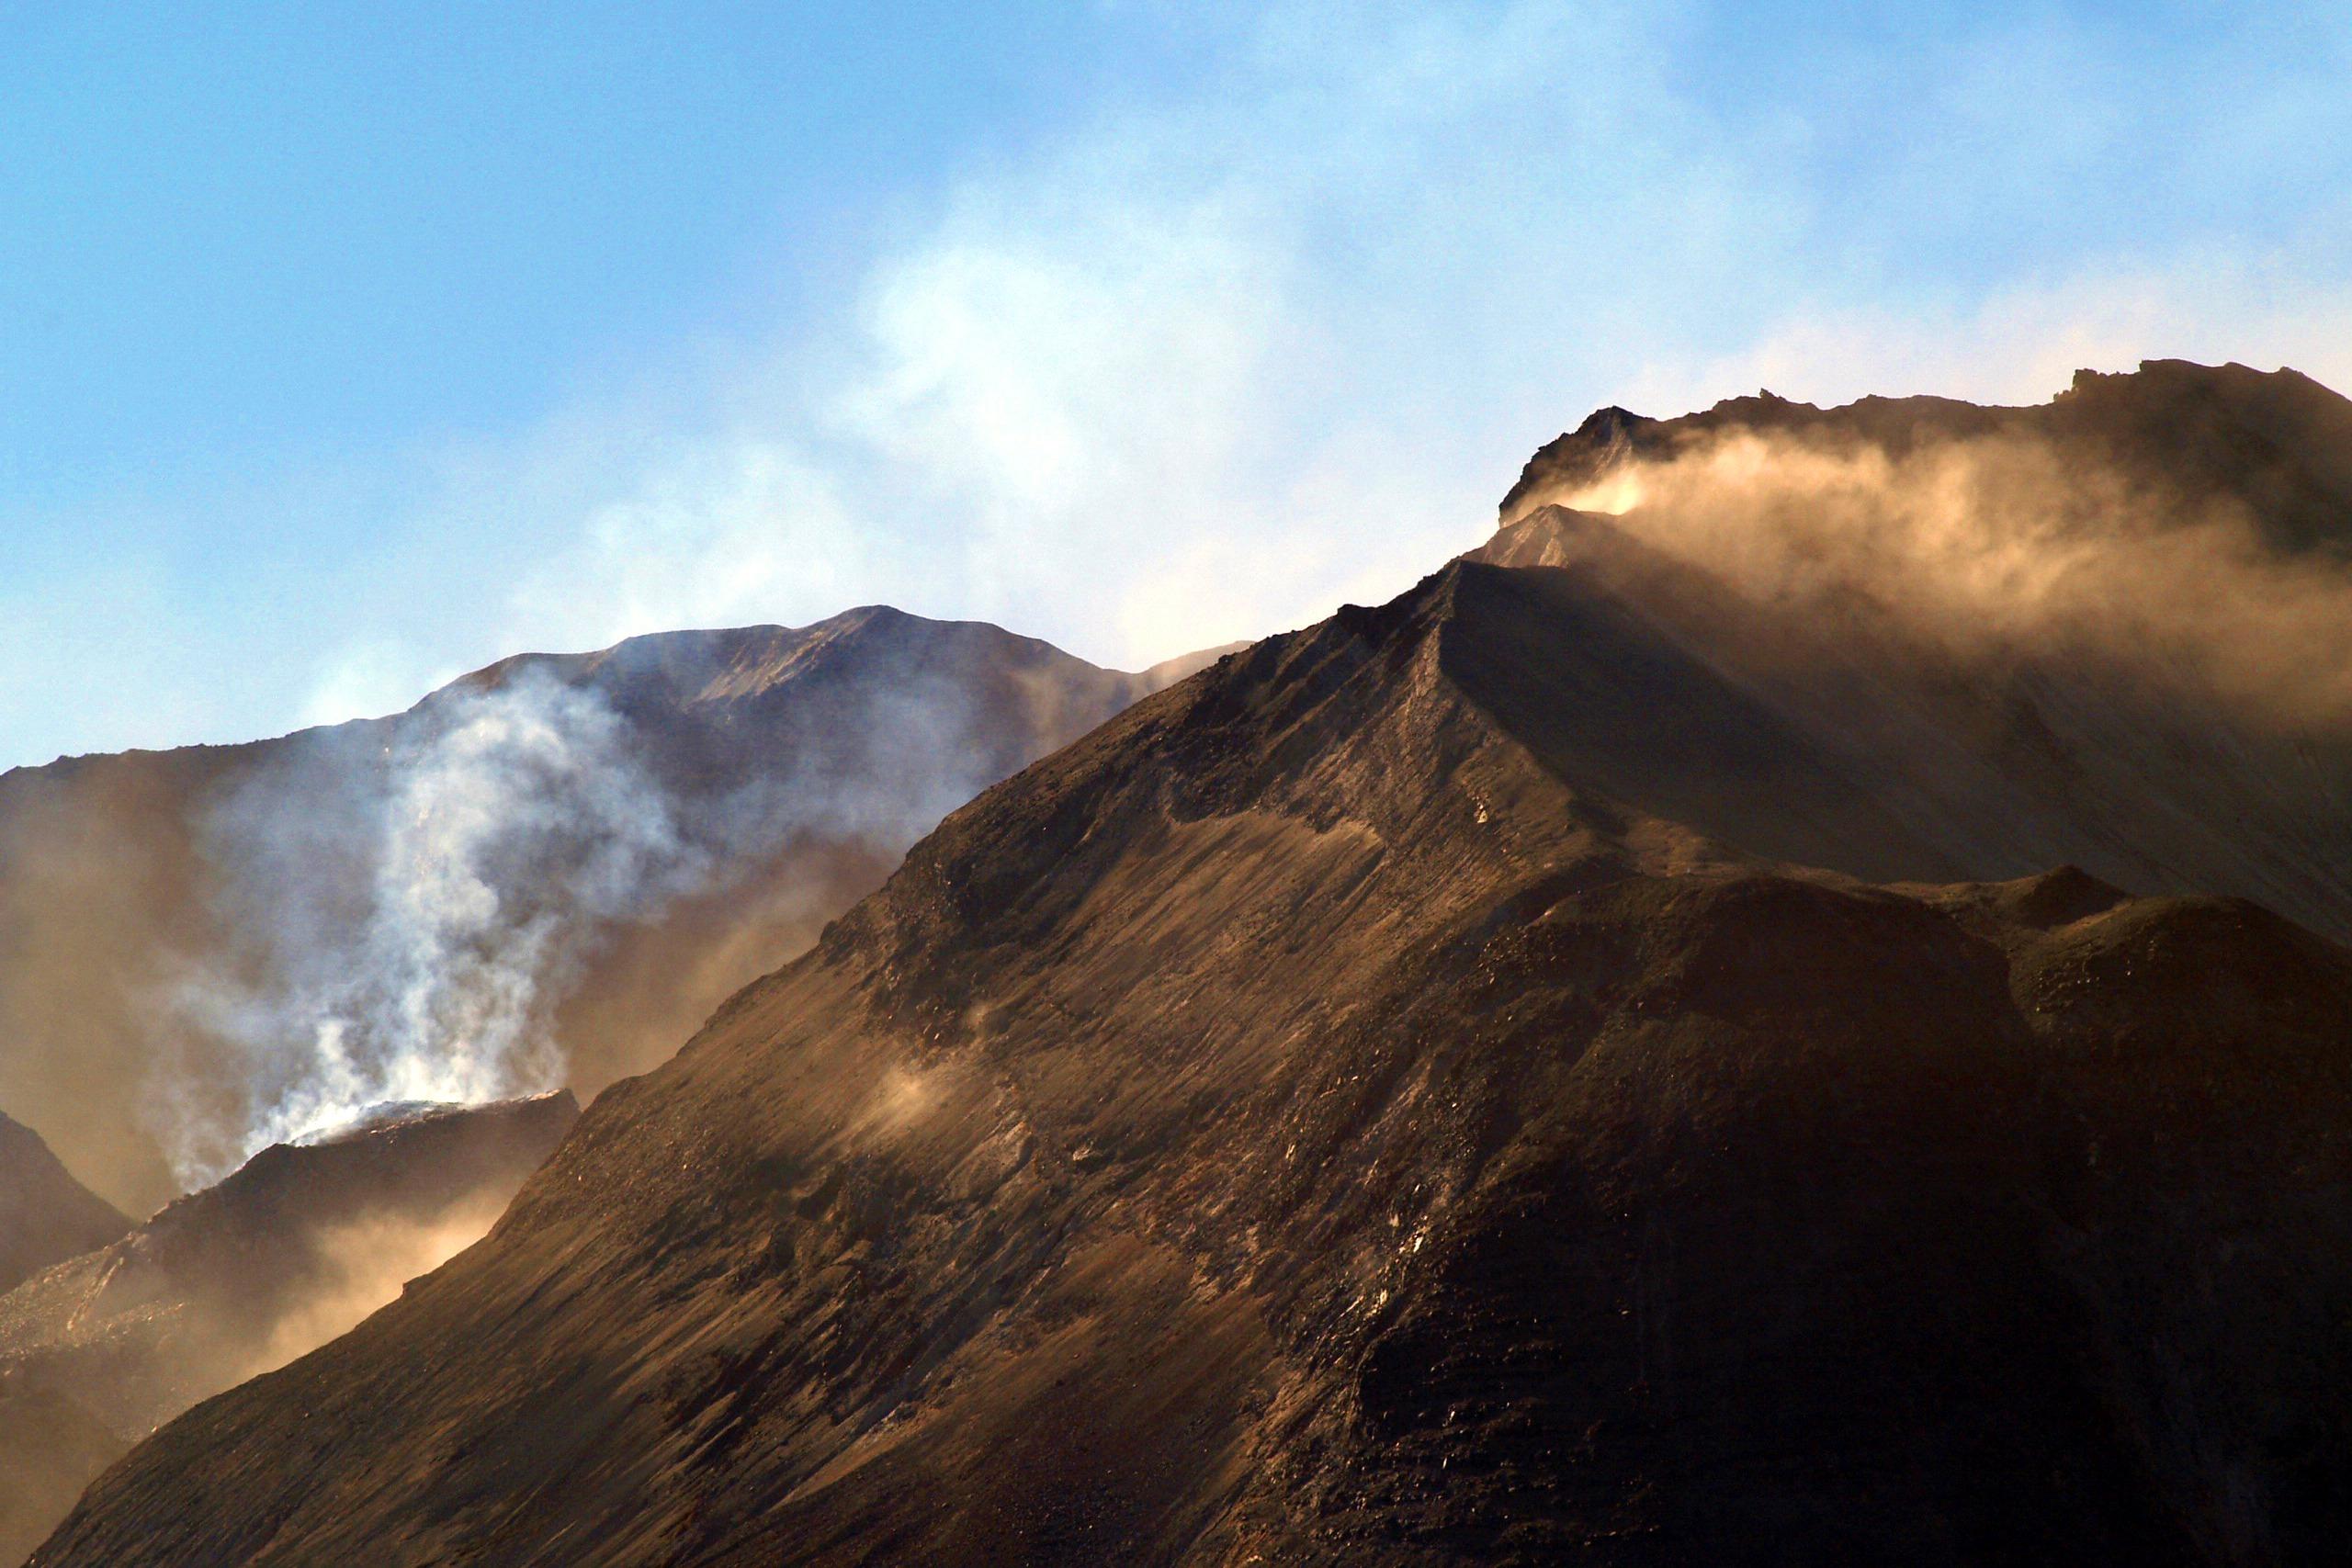 dating kiviä Mt St Helens